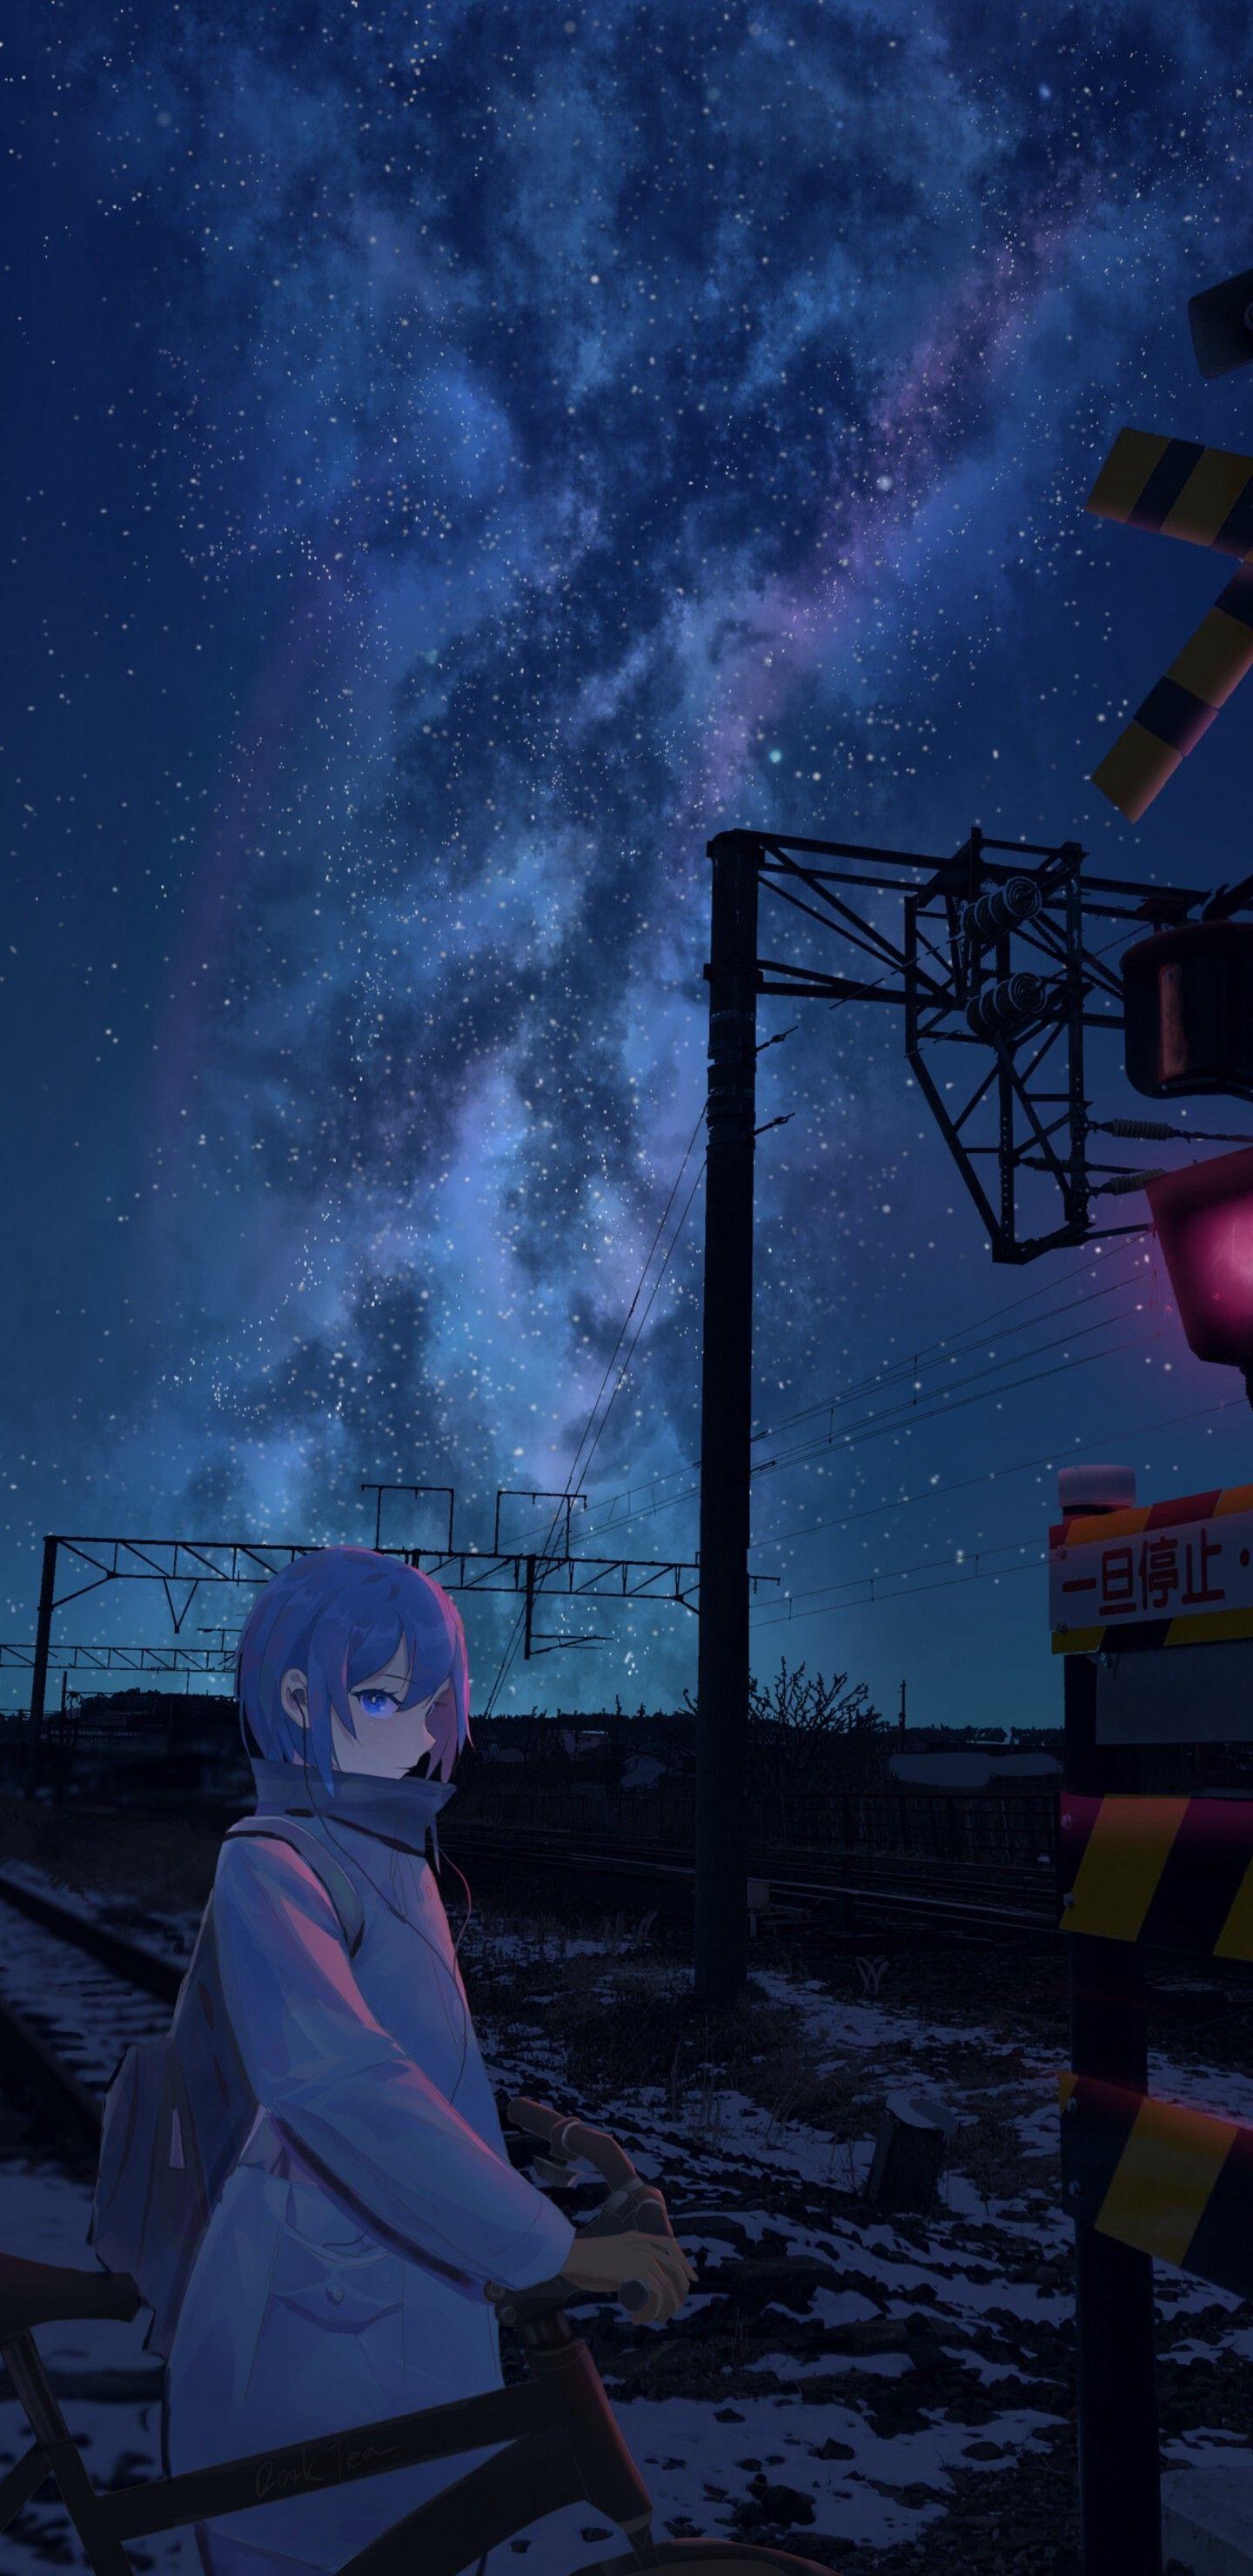 Anime Wallpaper Hd Aesthetic Anime Wallpapers Samsung